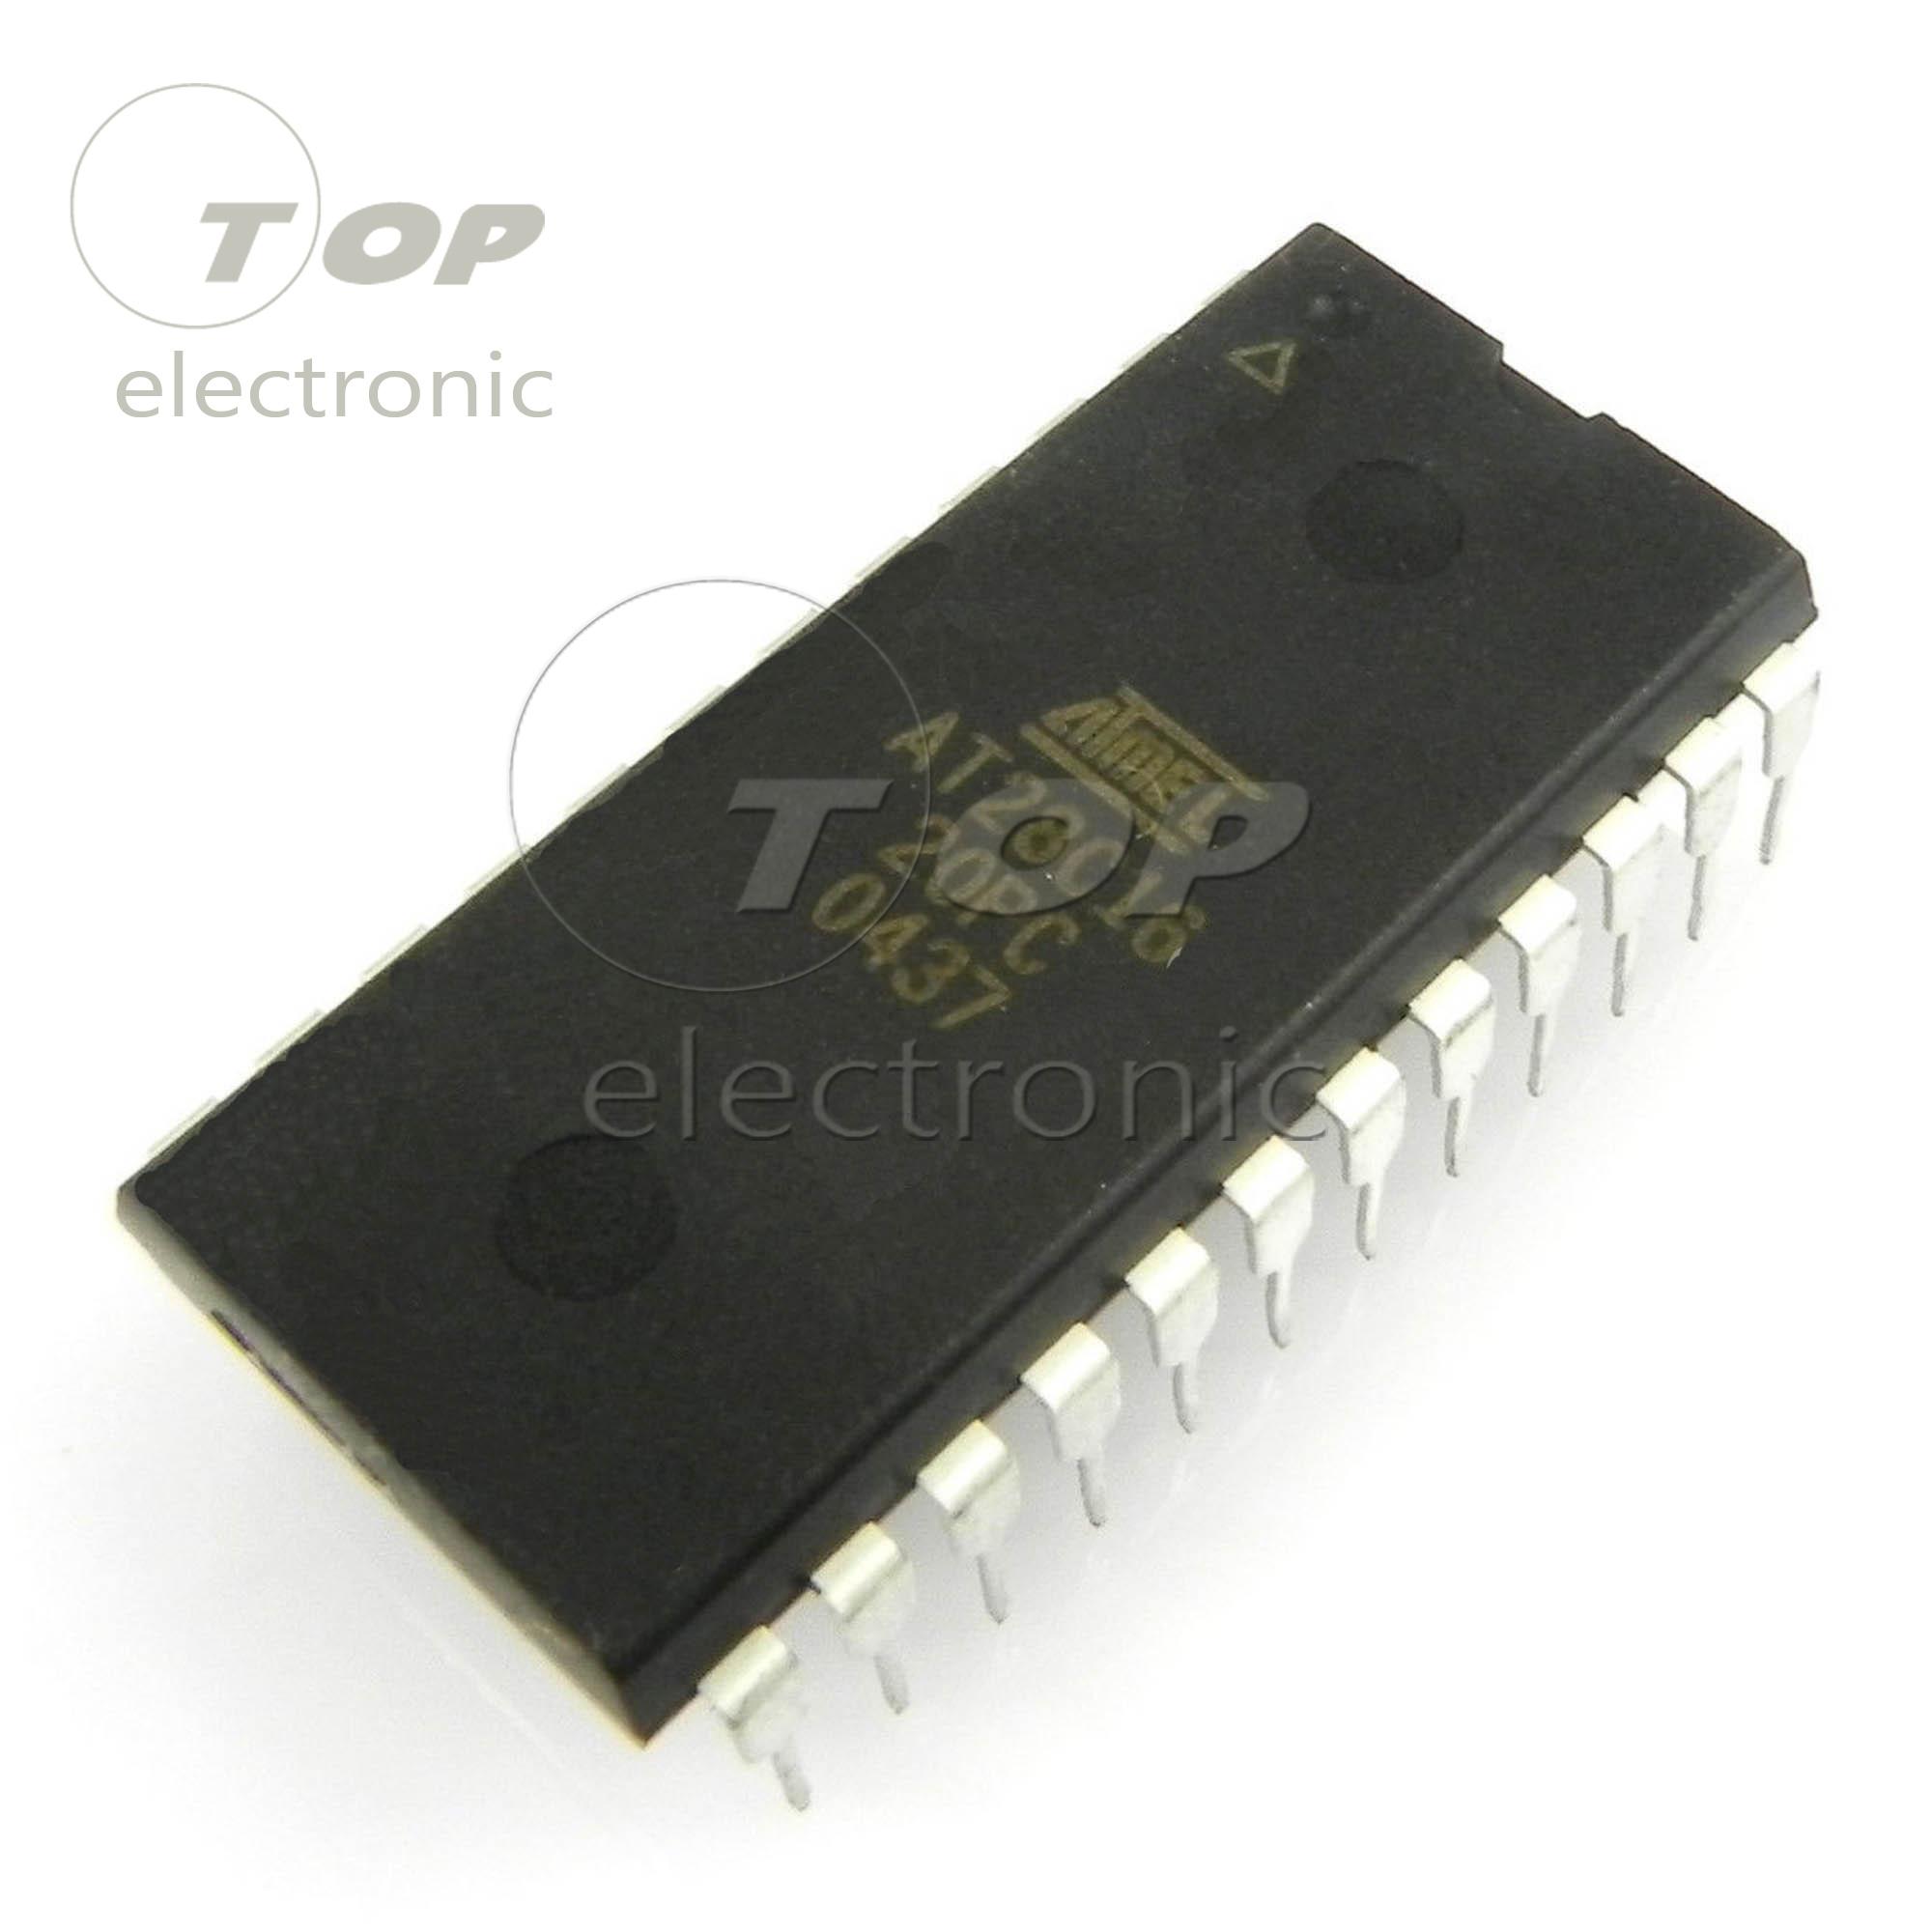 10Pcs AT28C16-15PU CMOS E2PROM DIP-24 ATMEL